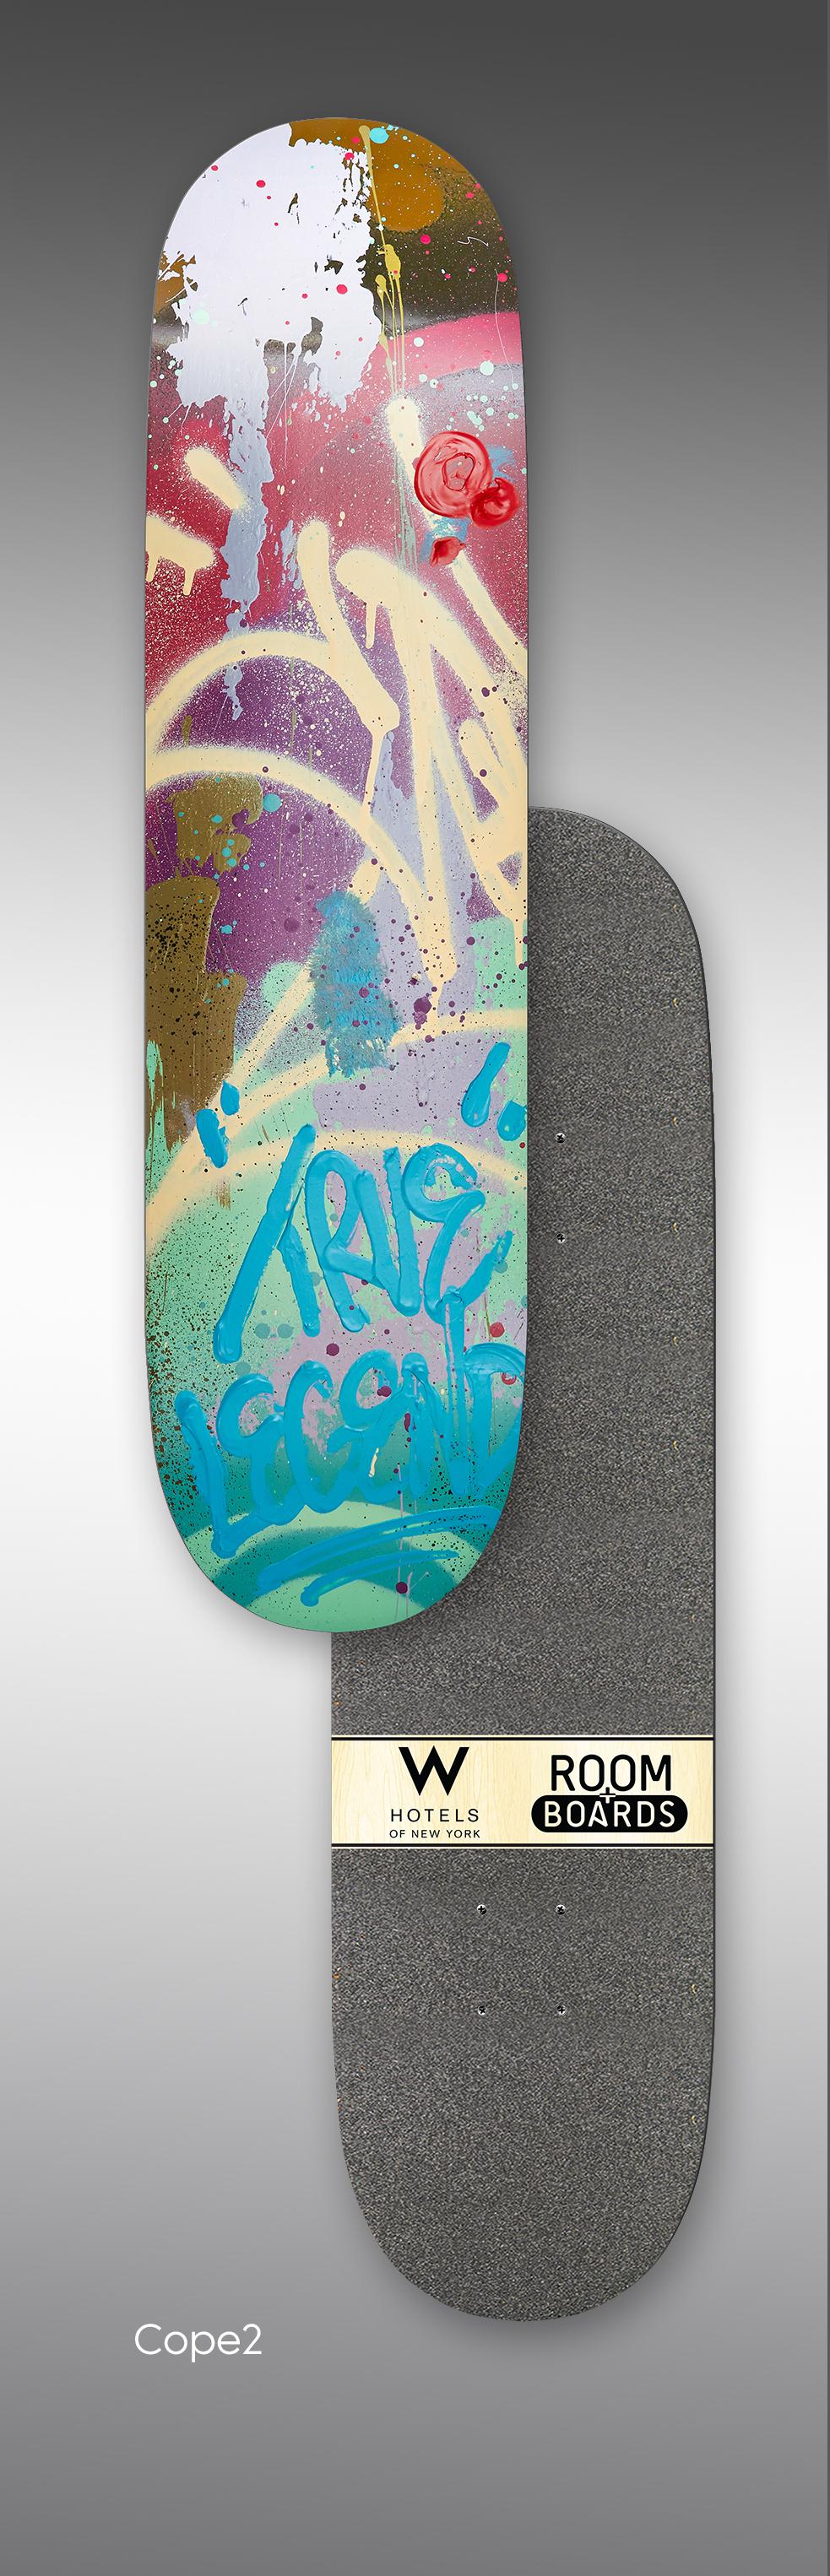 2013-06-20-cope2board.jpg